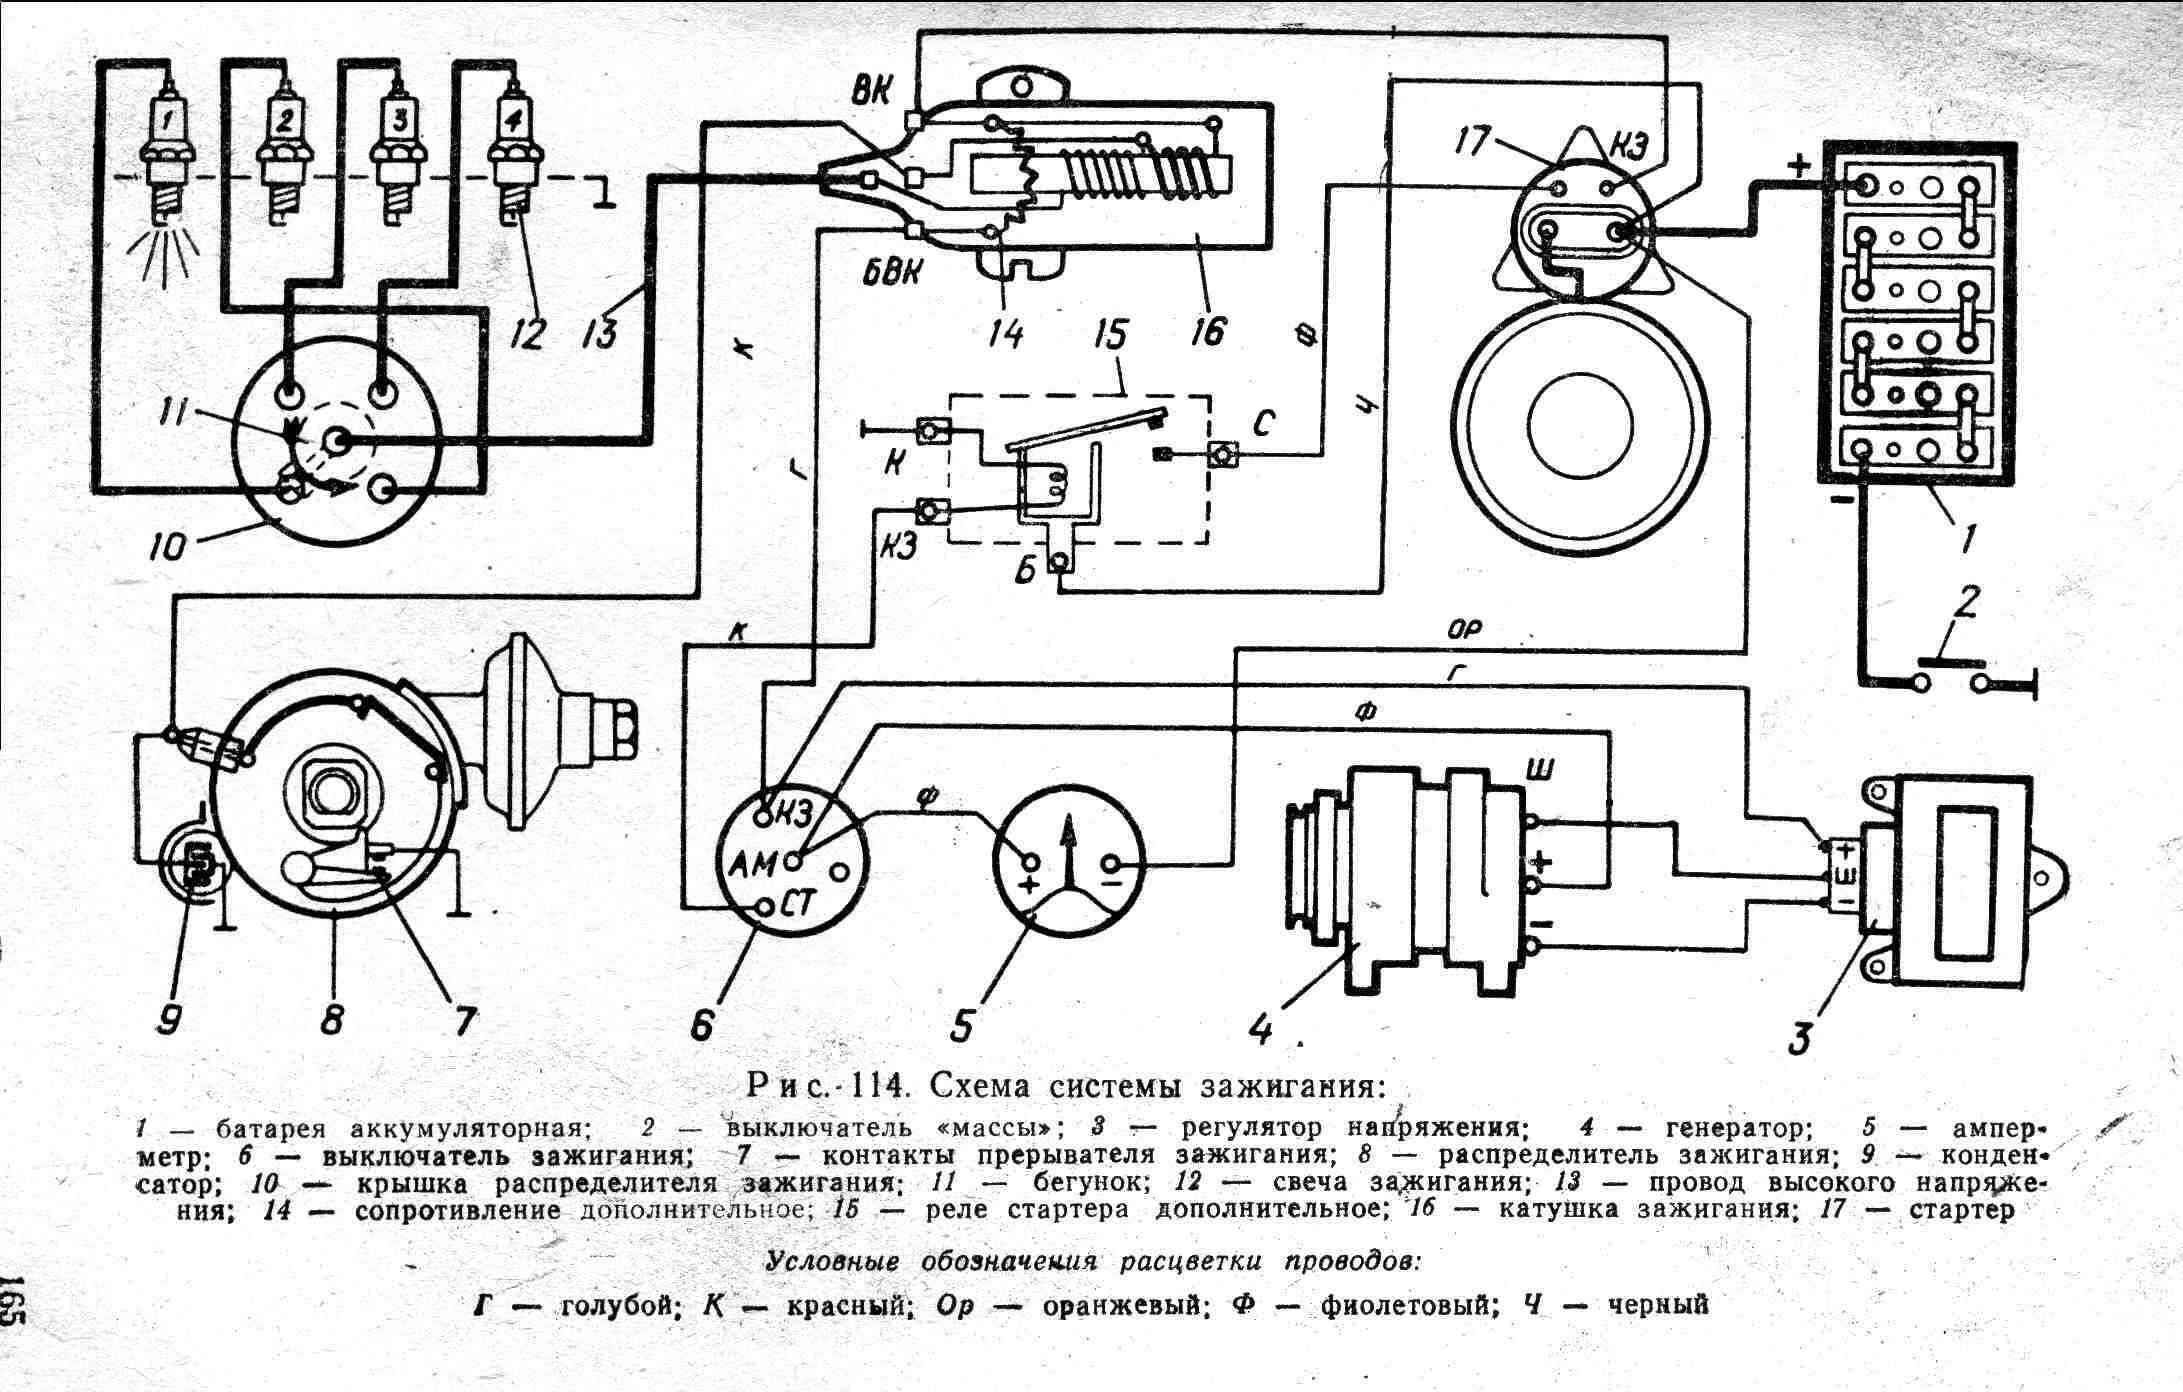 Уаз–3741, –3909, –3962, –2206 схема электрооборудования.